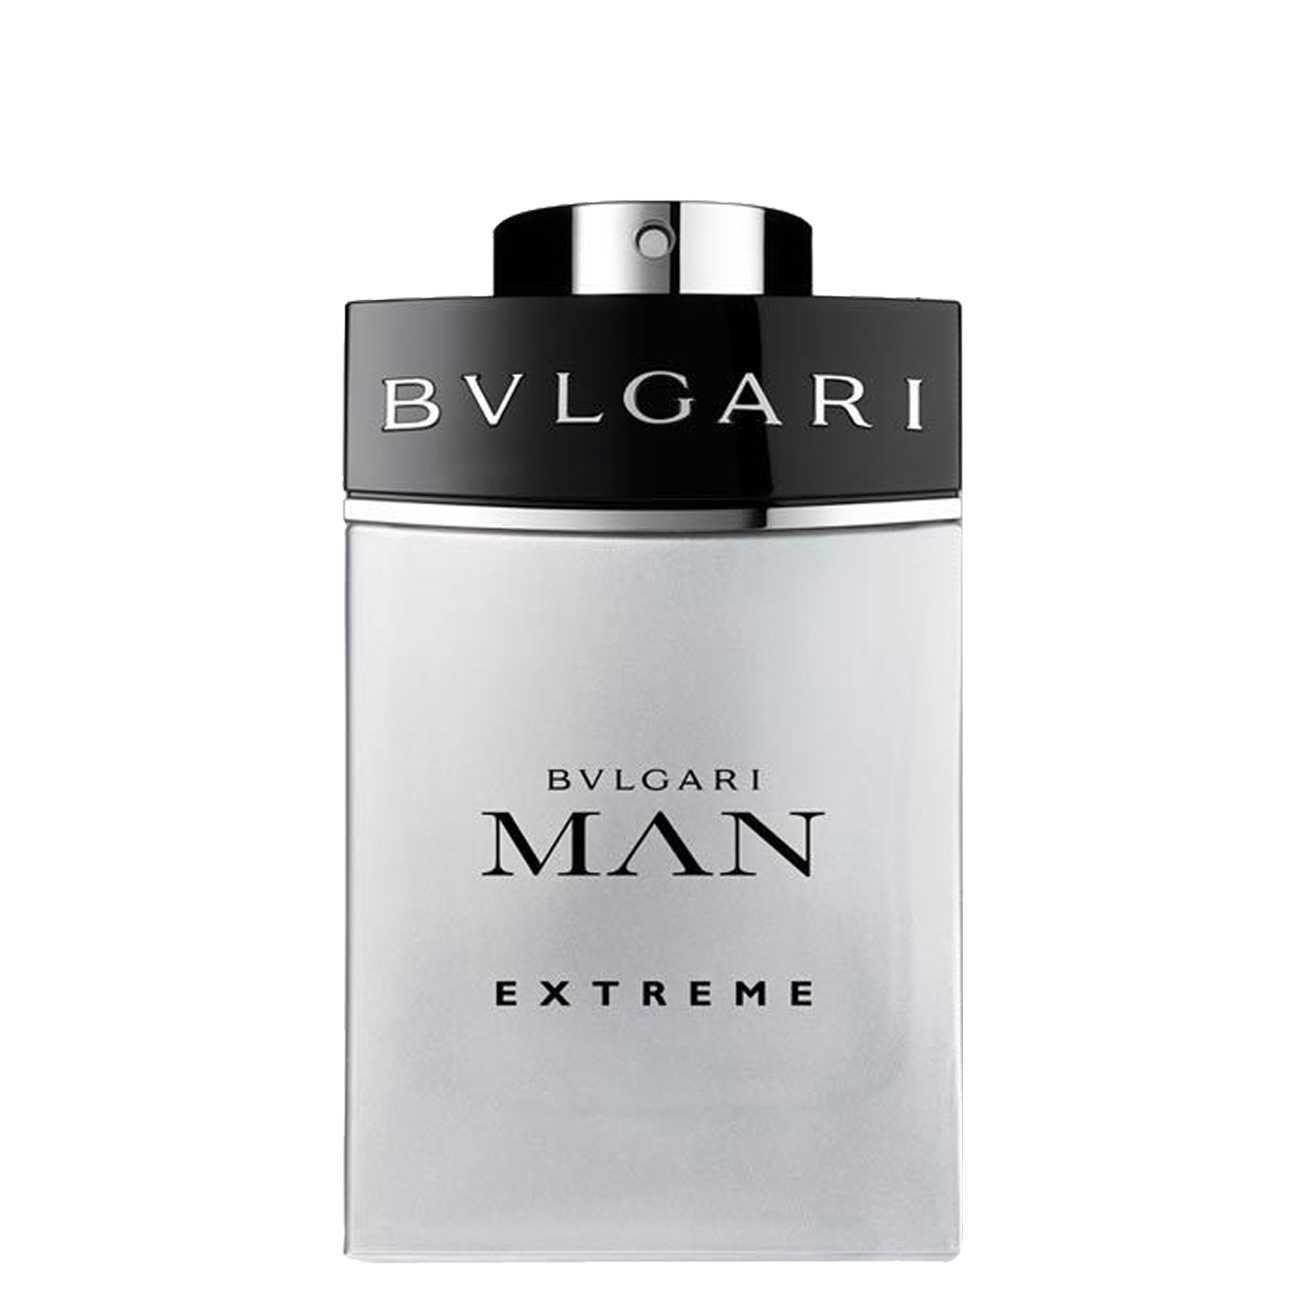 MAN EXTREME 100ml